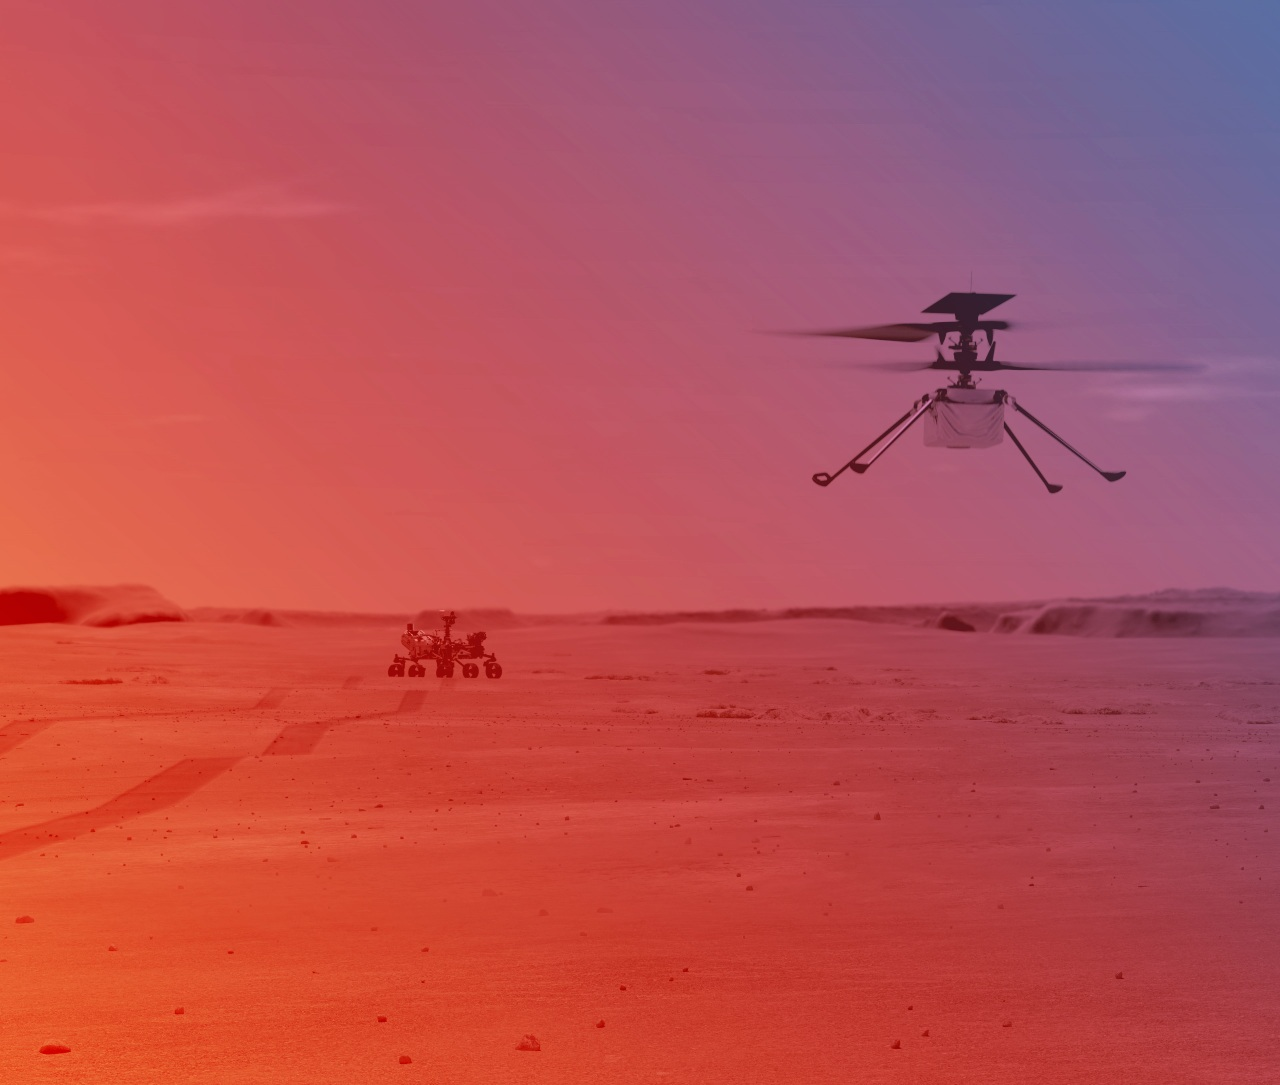 NASA helicóptero Ingenuity listo primer vuelo